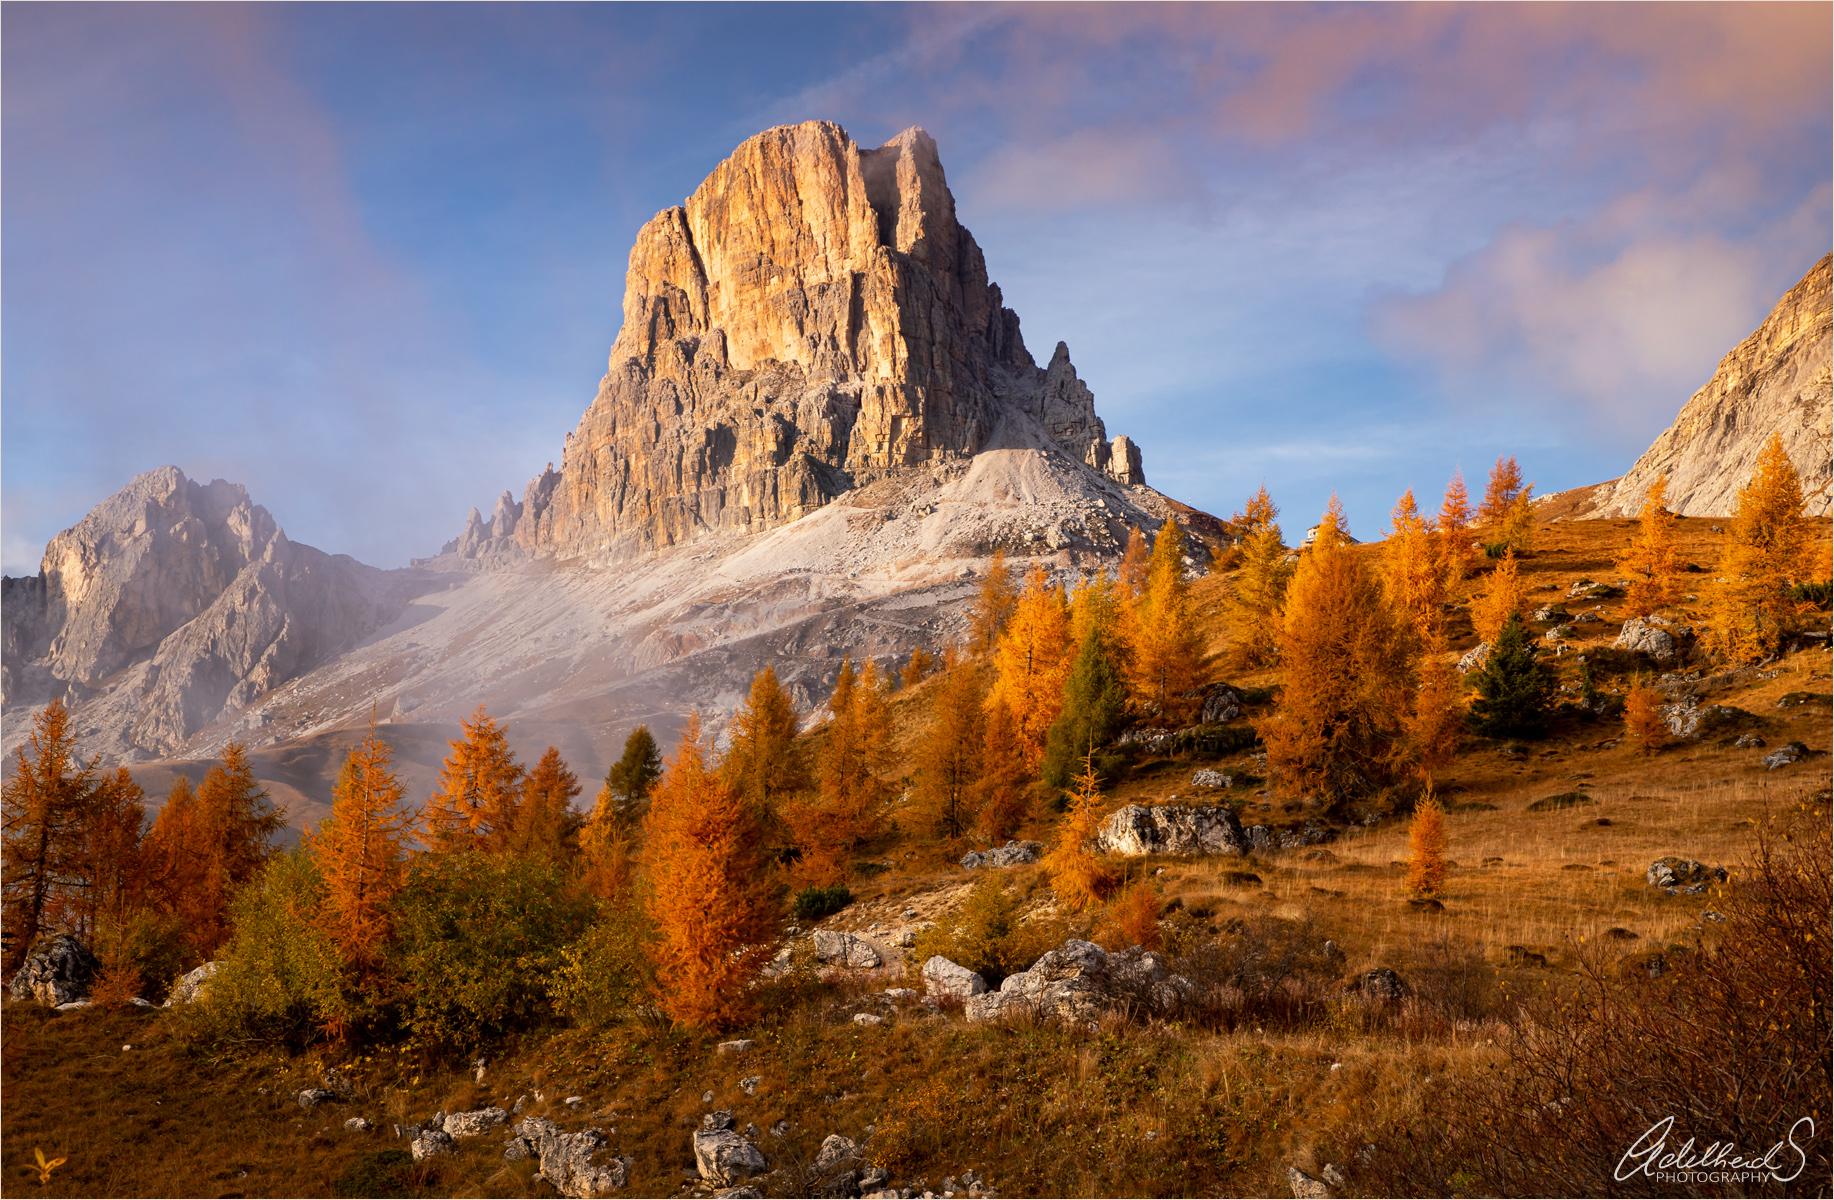 Averau Peak, Italy